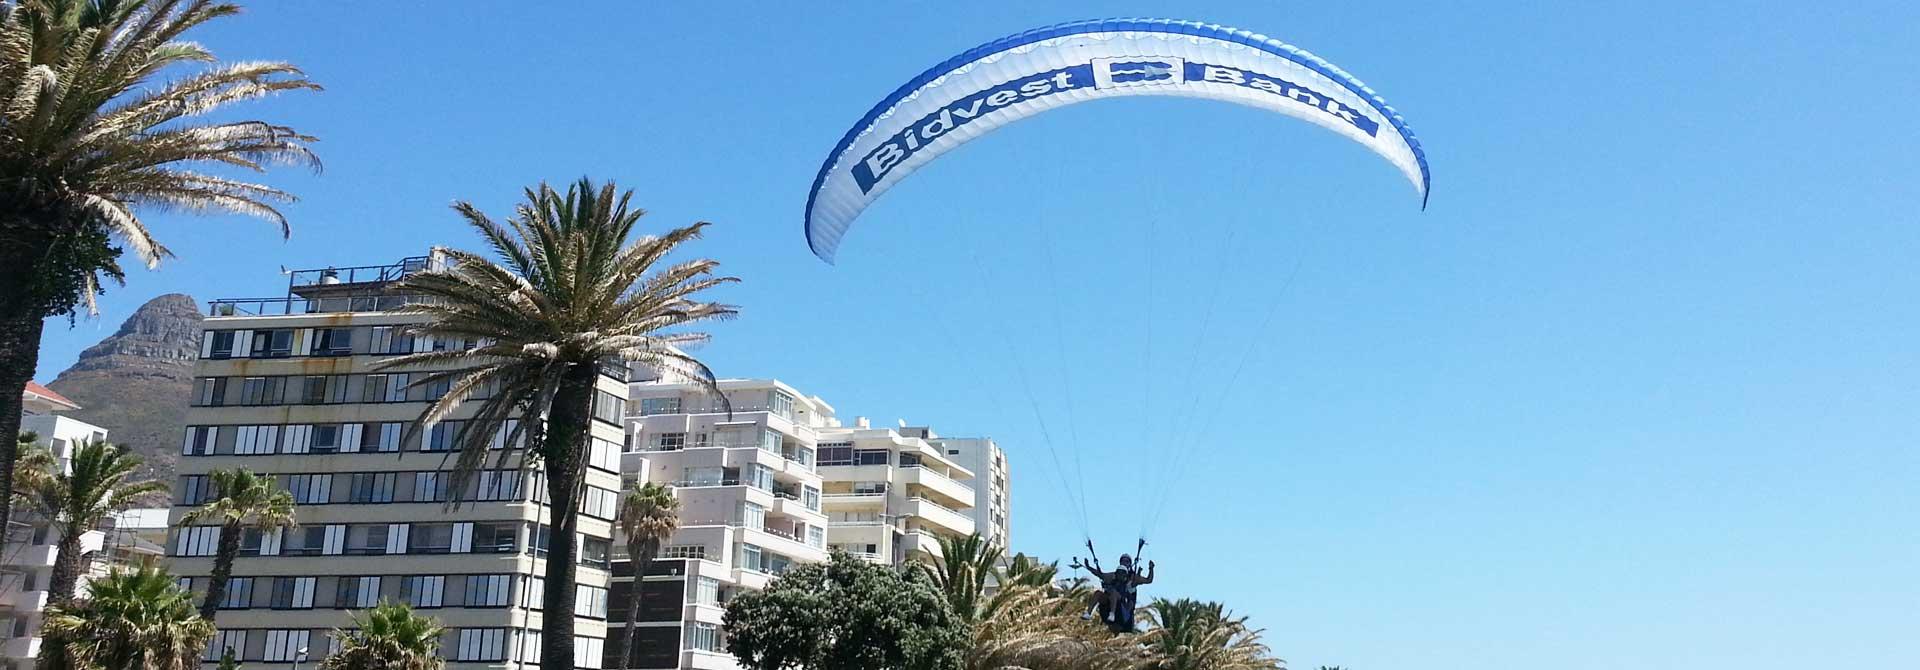 paragliding-cape-town-landing-seapoint